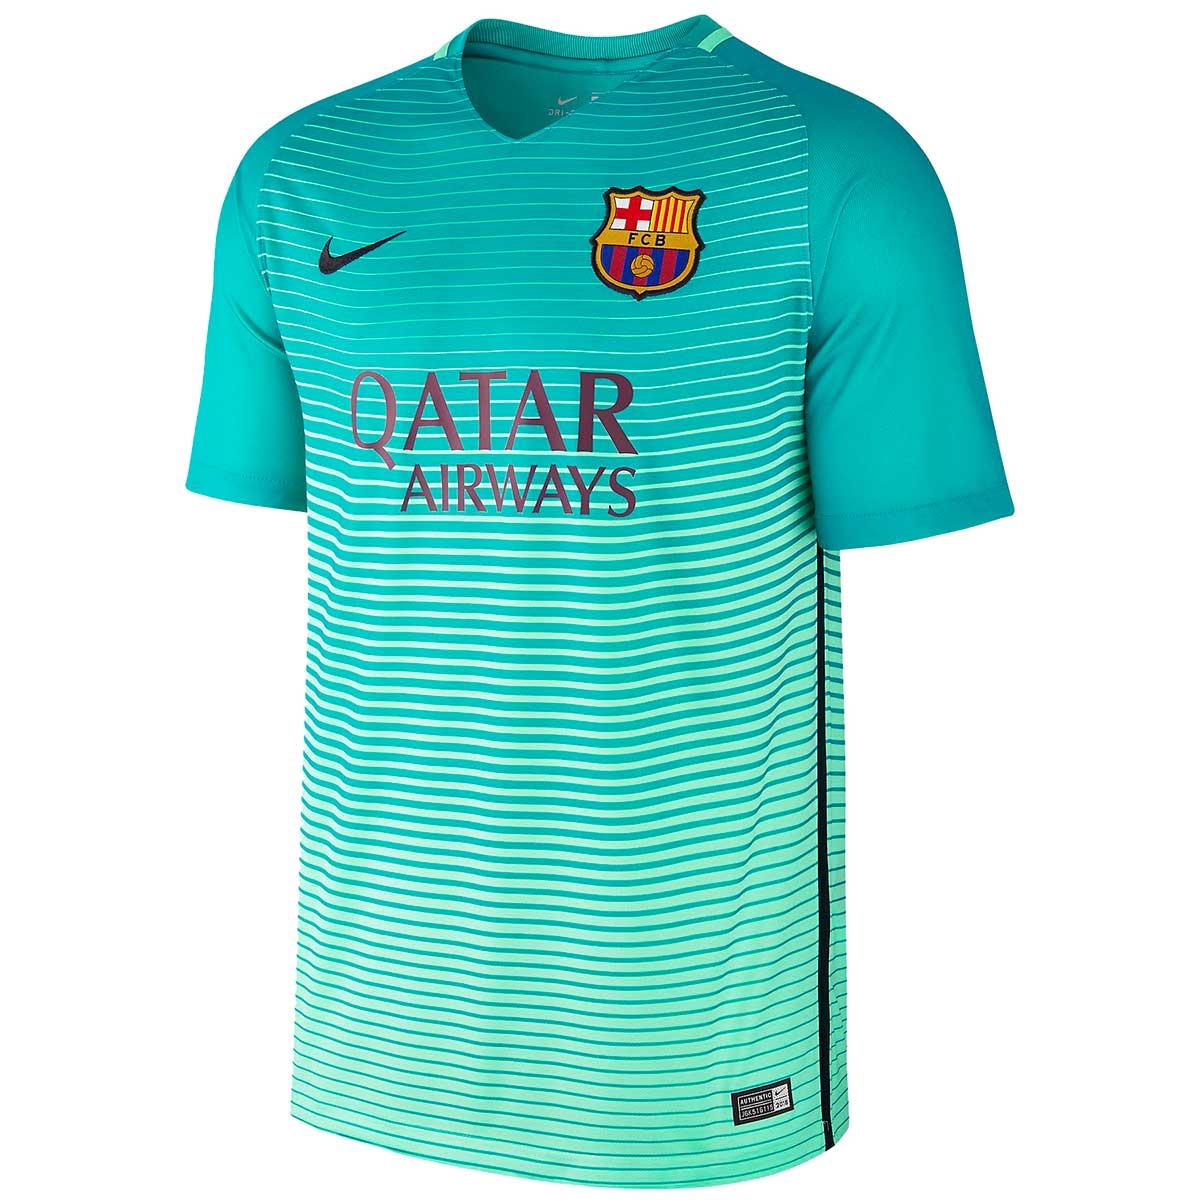 Buy Nike Fc Barcelona Jersey 2016 17 Green Online In India